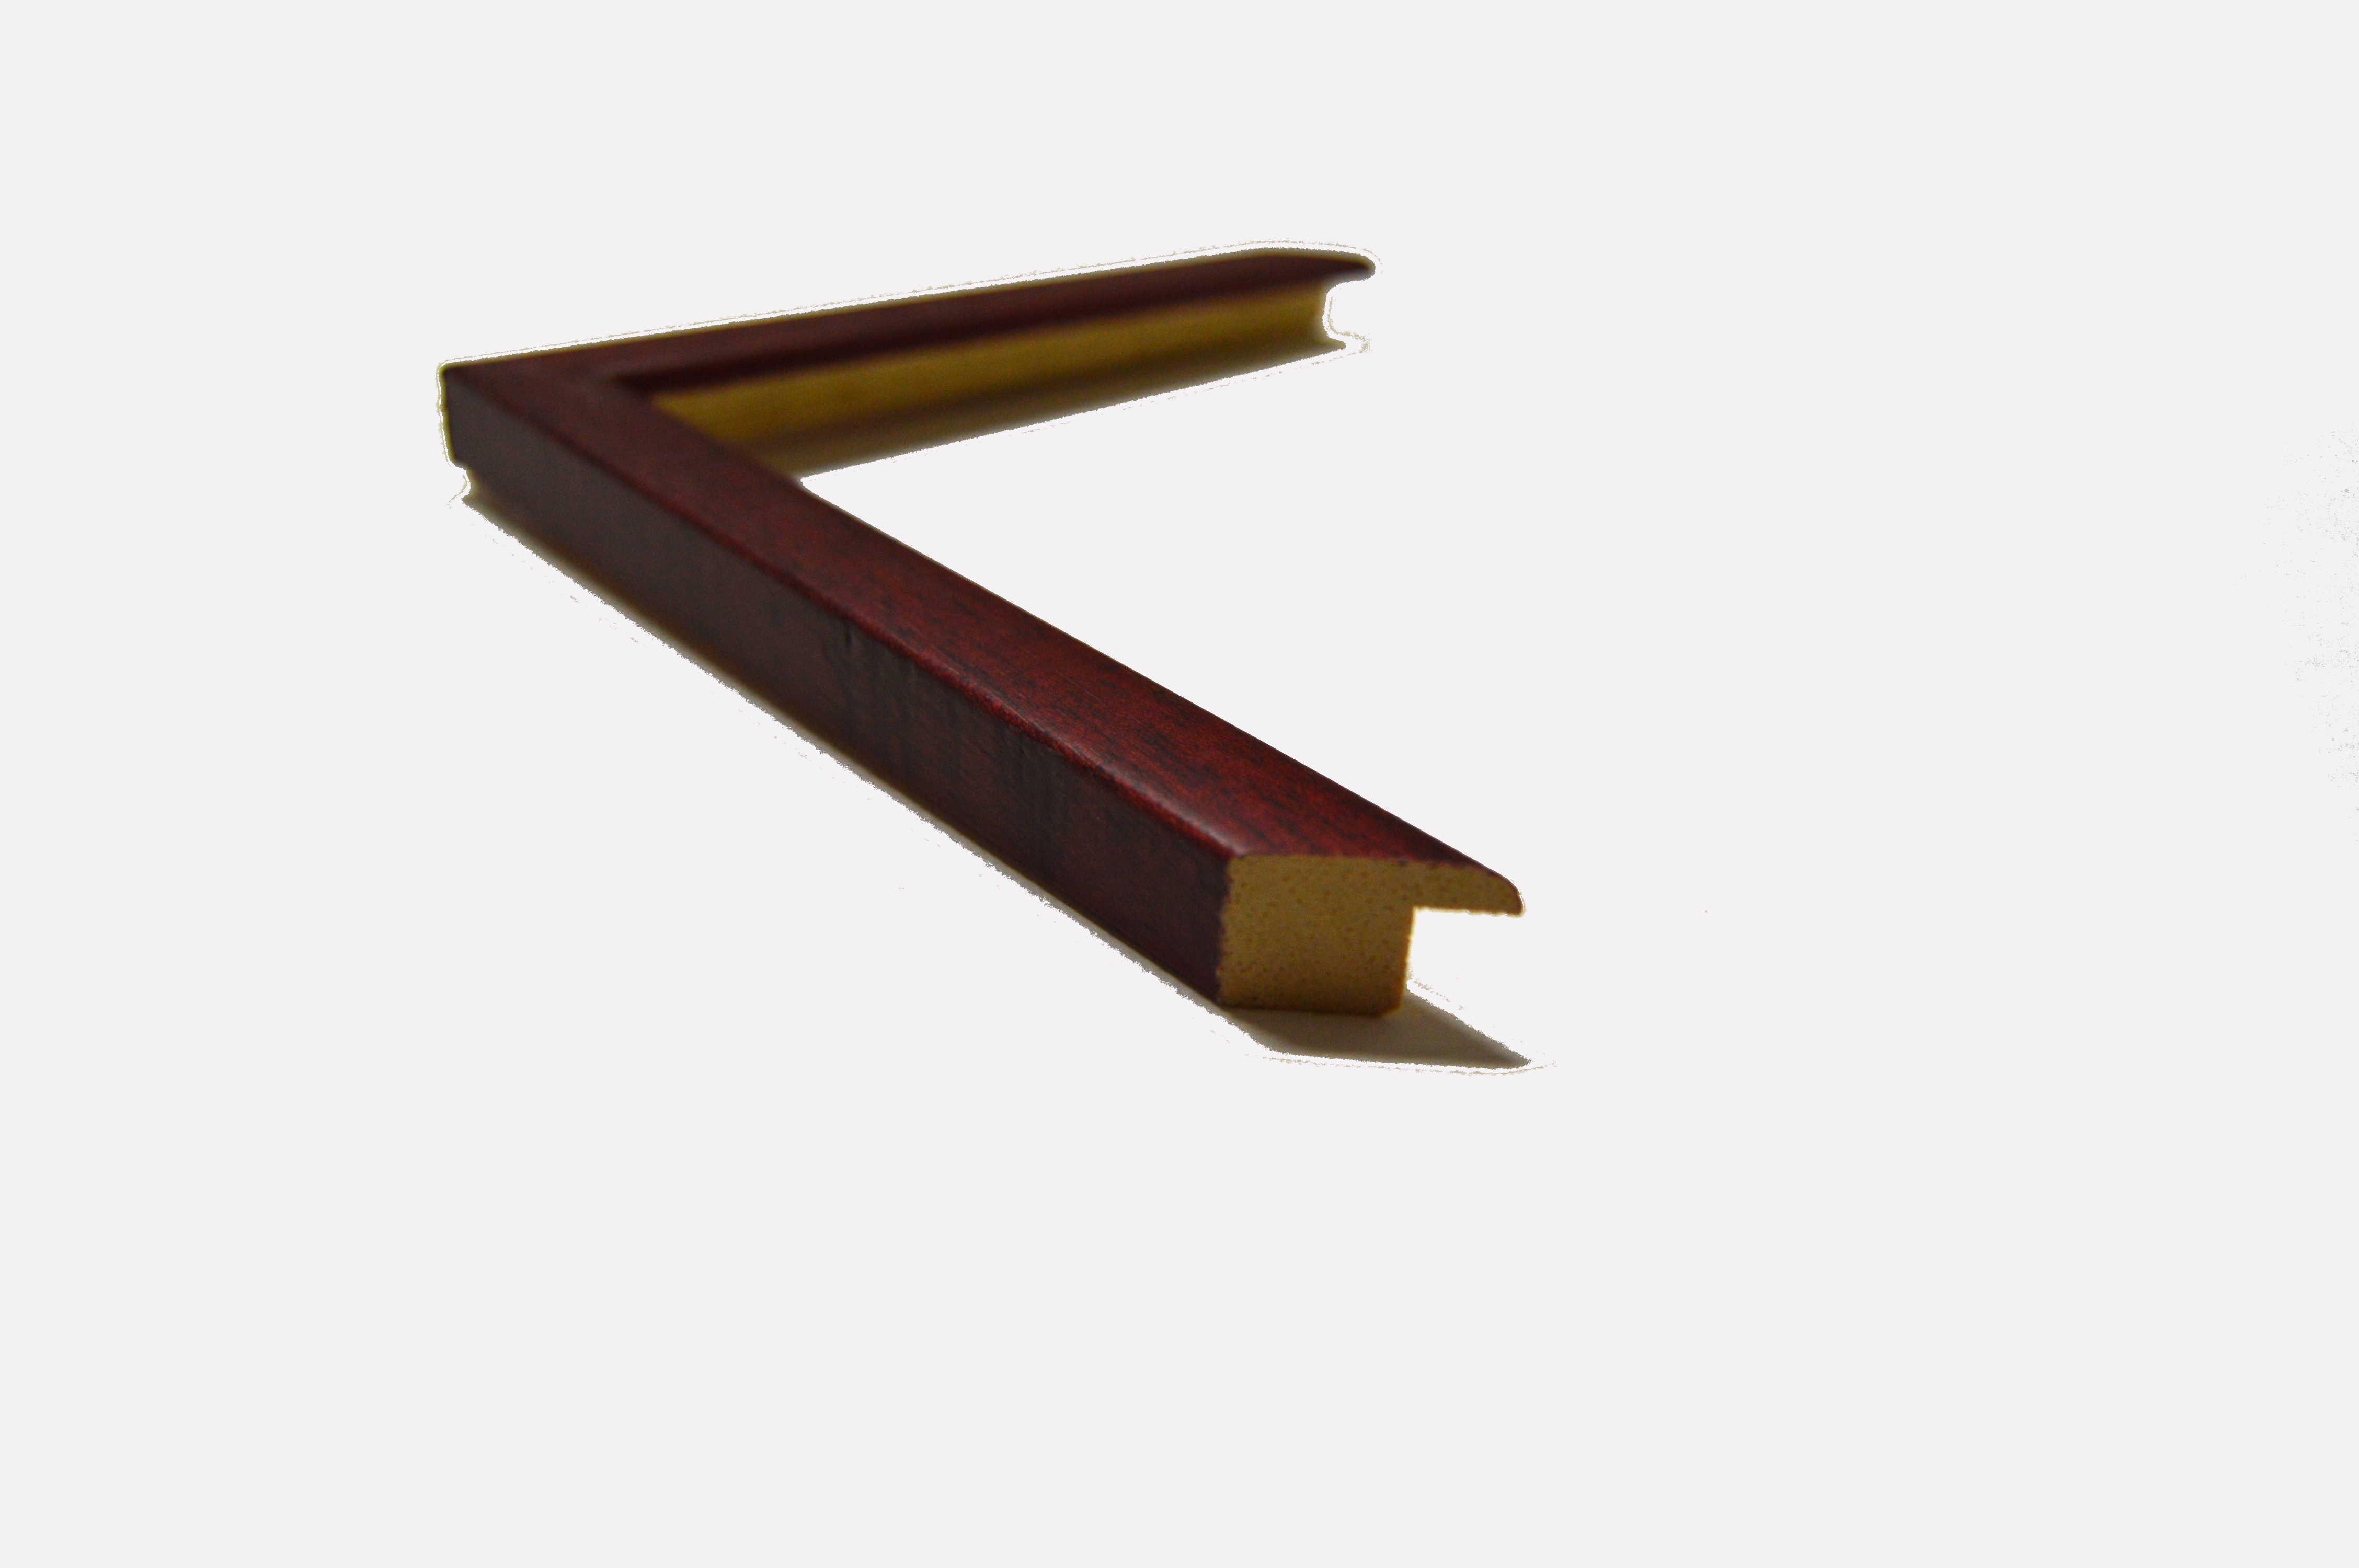 00290-900-BURDEOS-ancho1,8cm-perfil